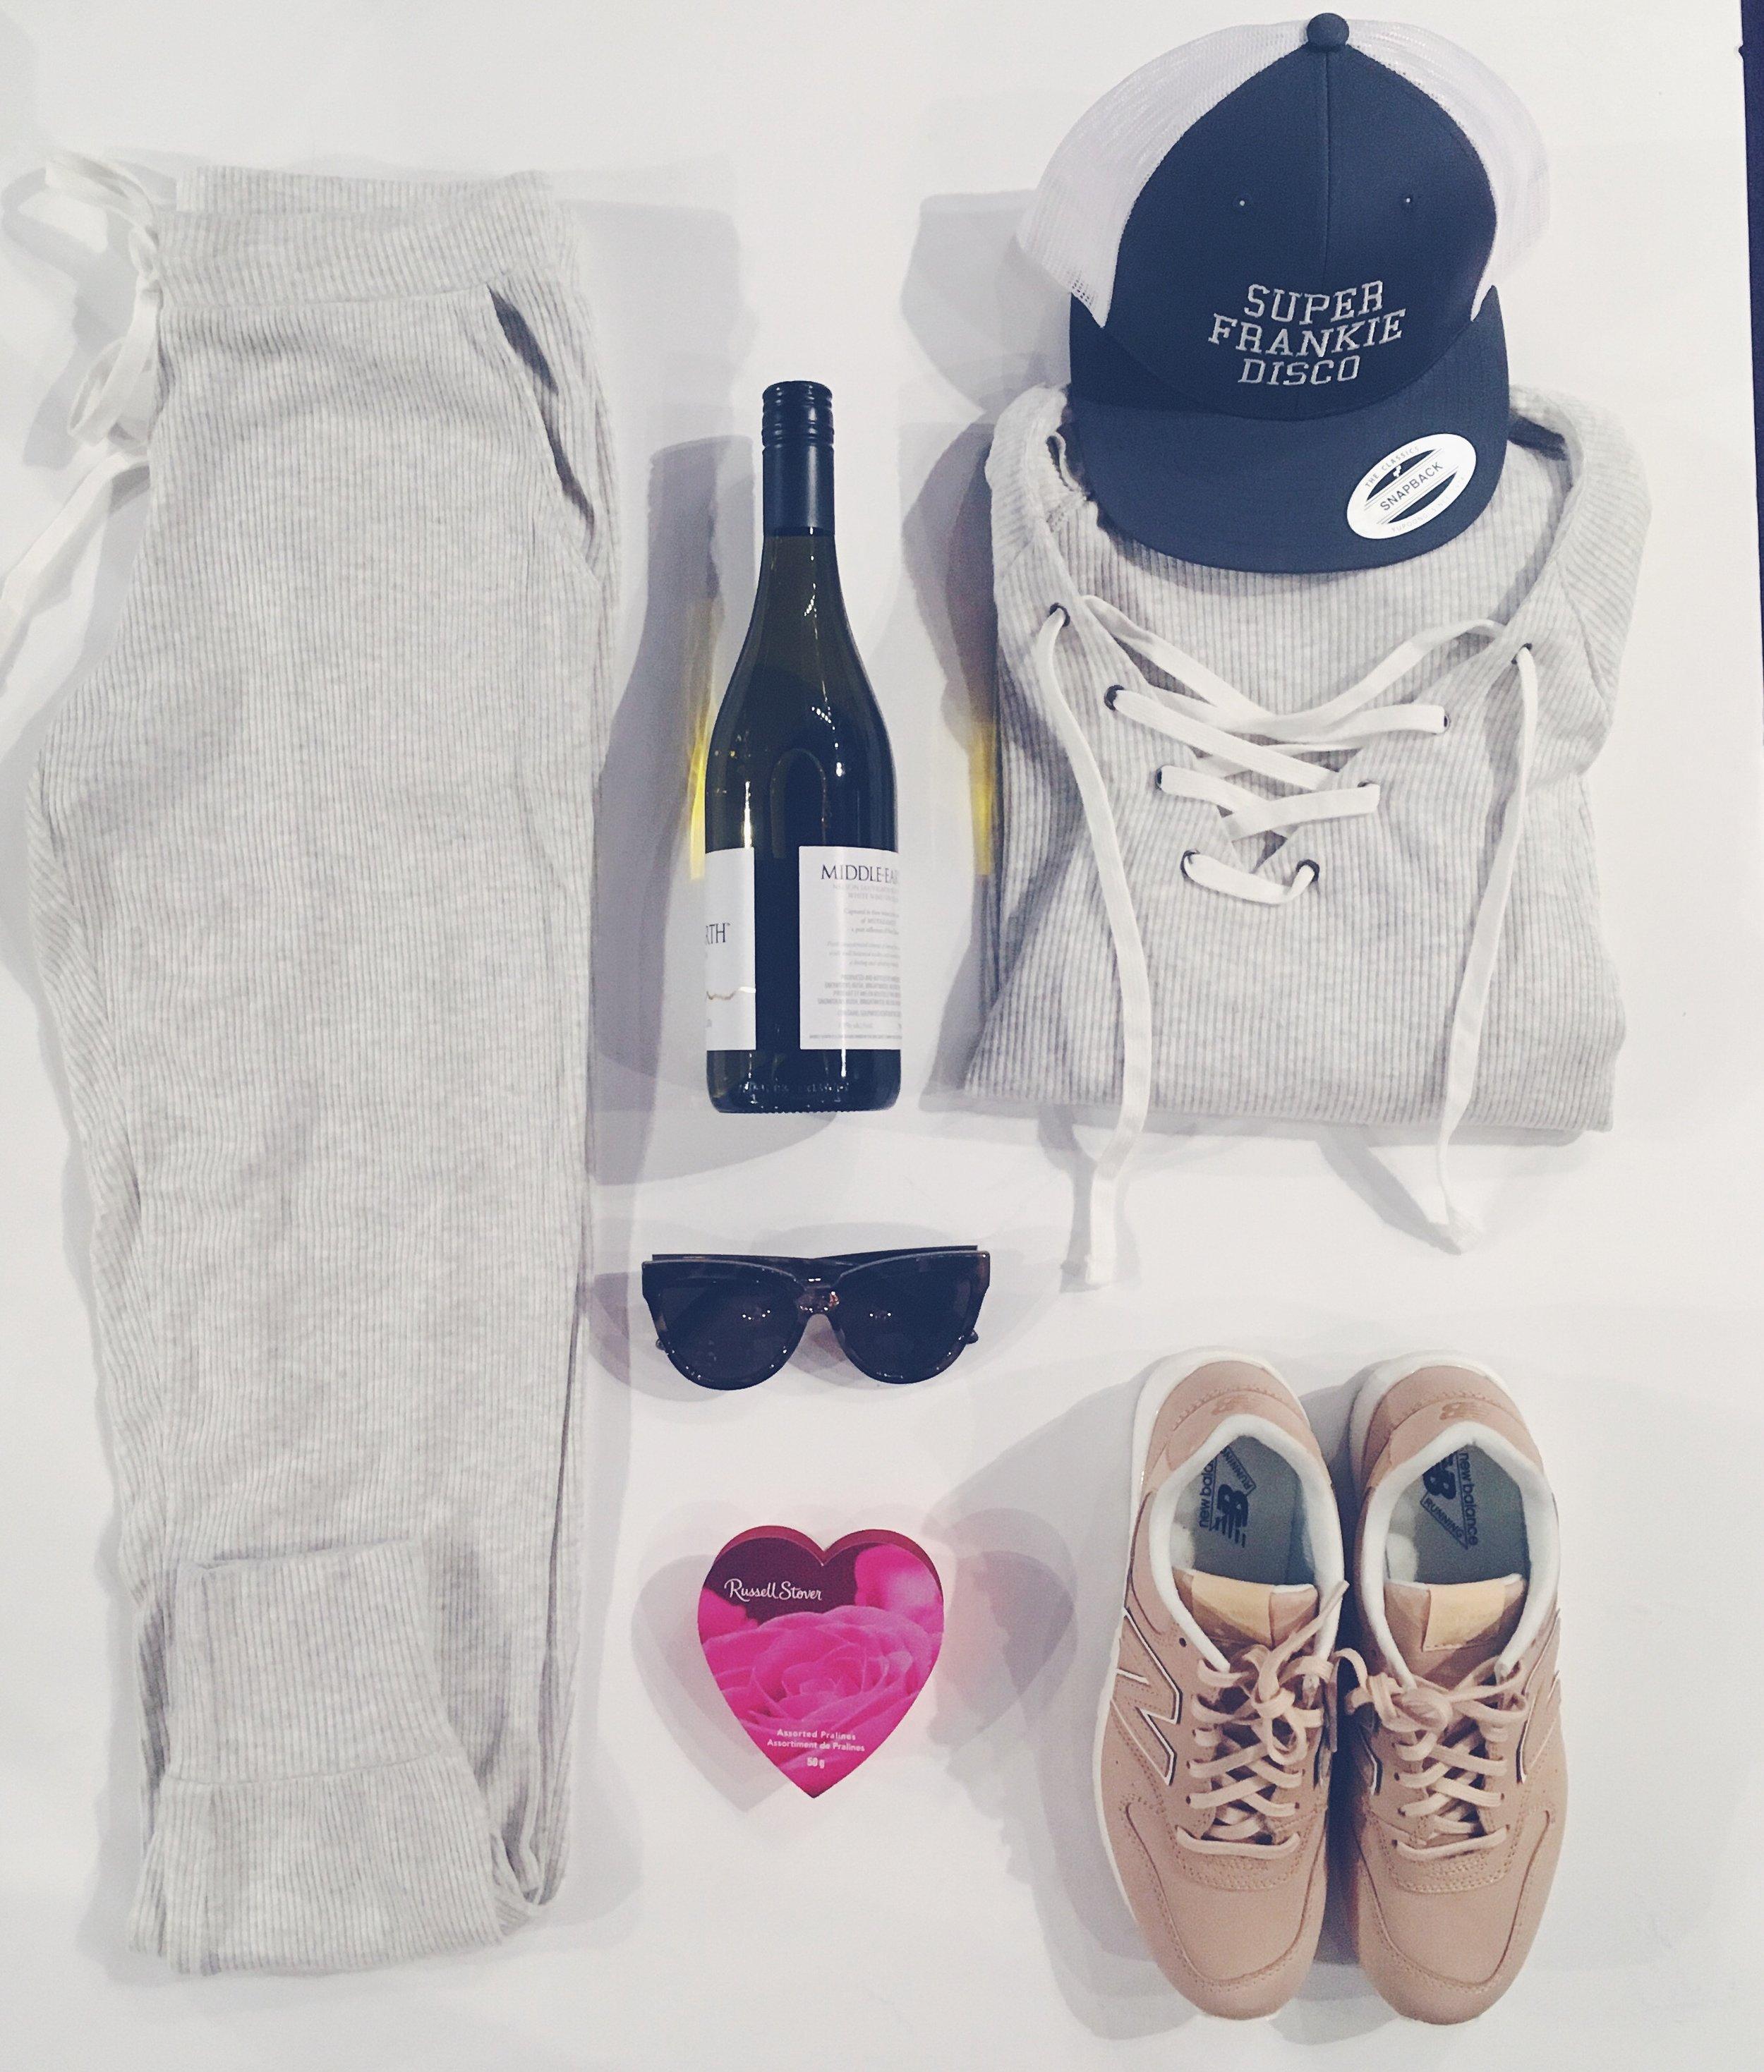 Velvet Sweater $198 Velvet Pants $183 Le Specs Sunglasses $110 Chocolate & Wine at your discretion New Balance Runners $135 Super Frankie Disco Hat $35